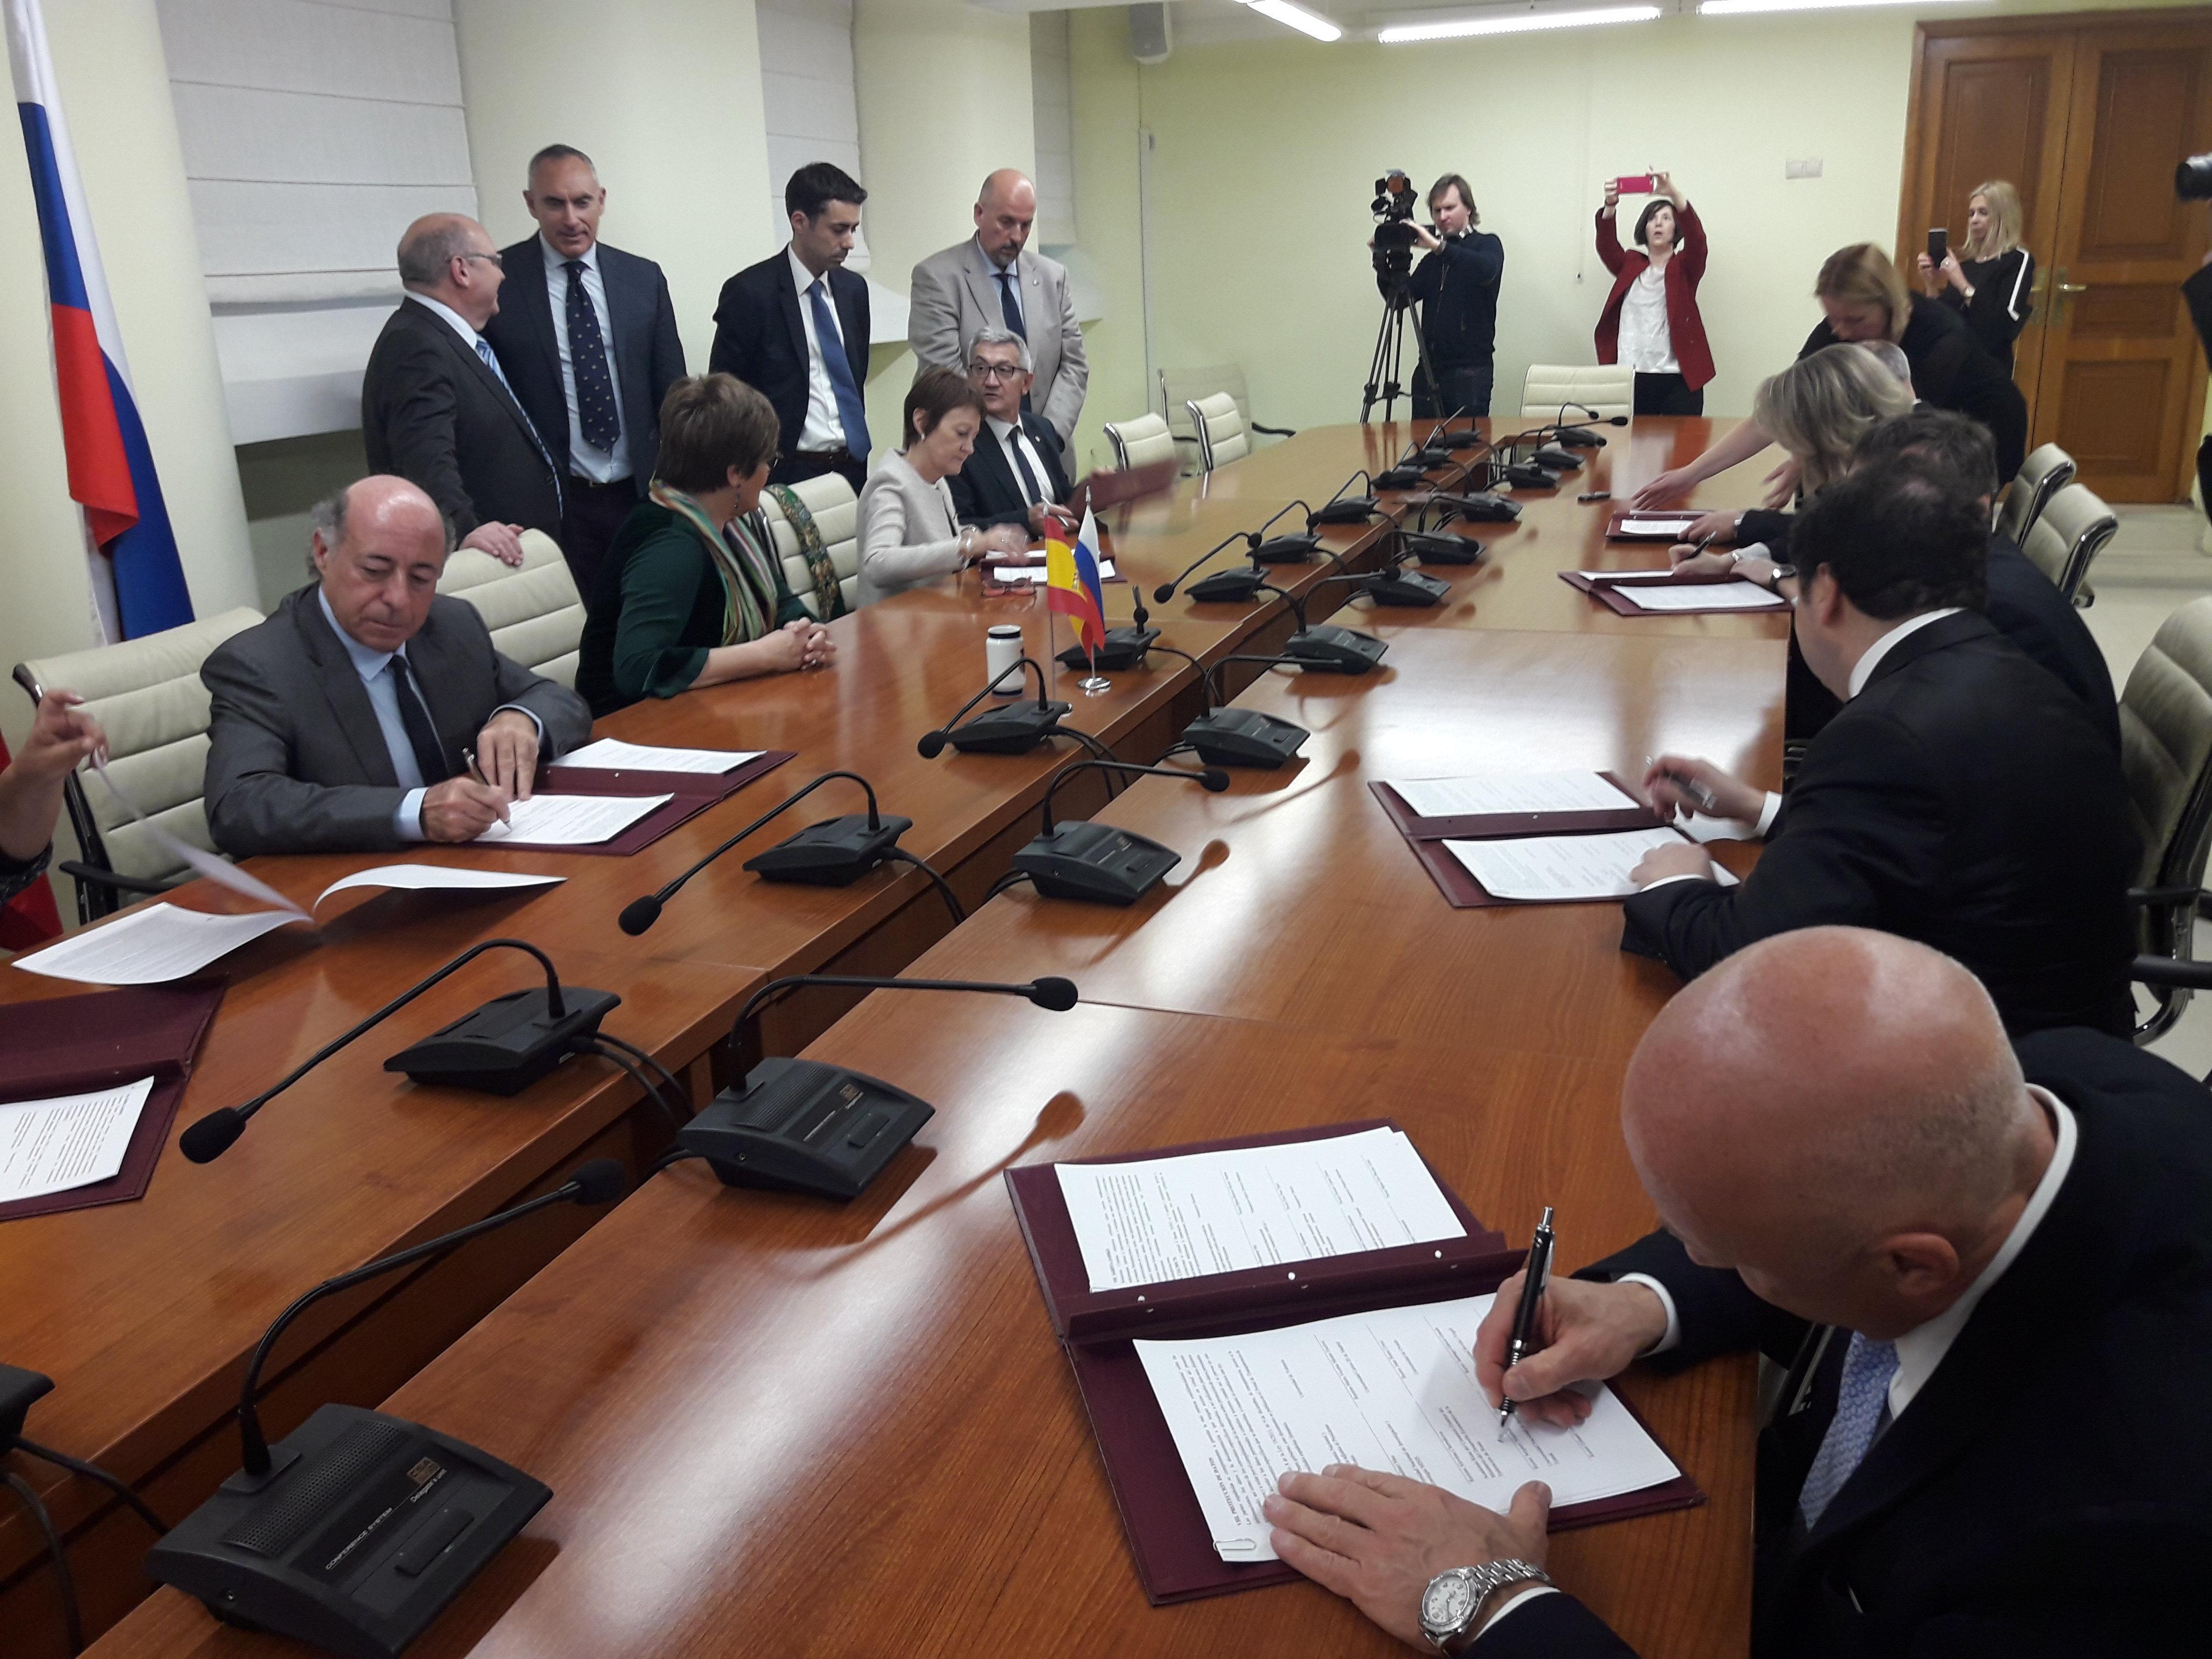 La ceremonia de la firma de la 'Alianza de universidades ruso-españolas'